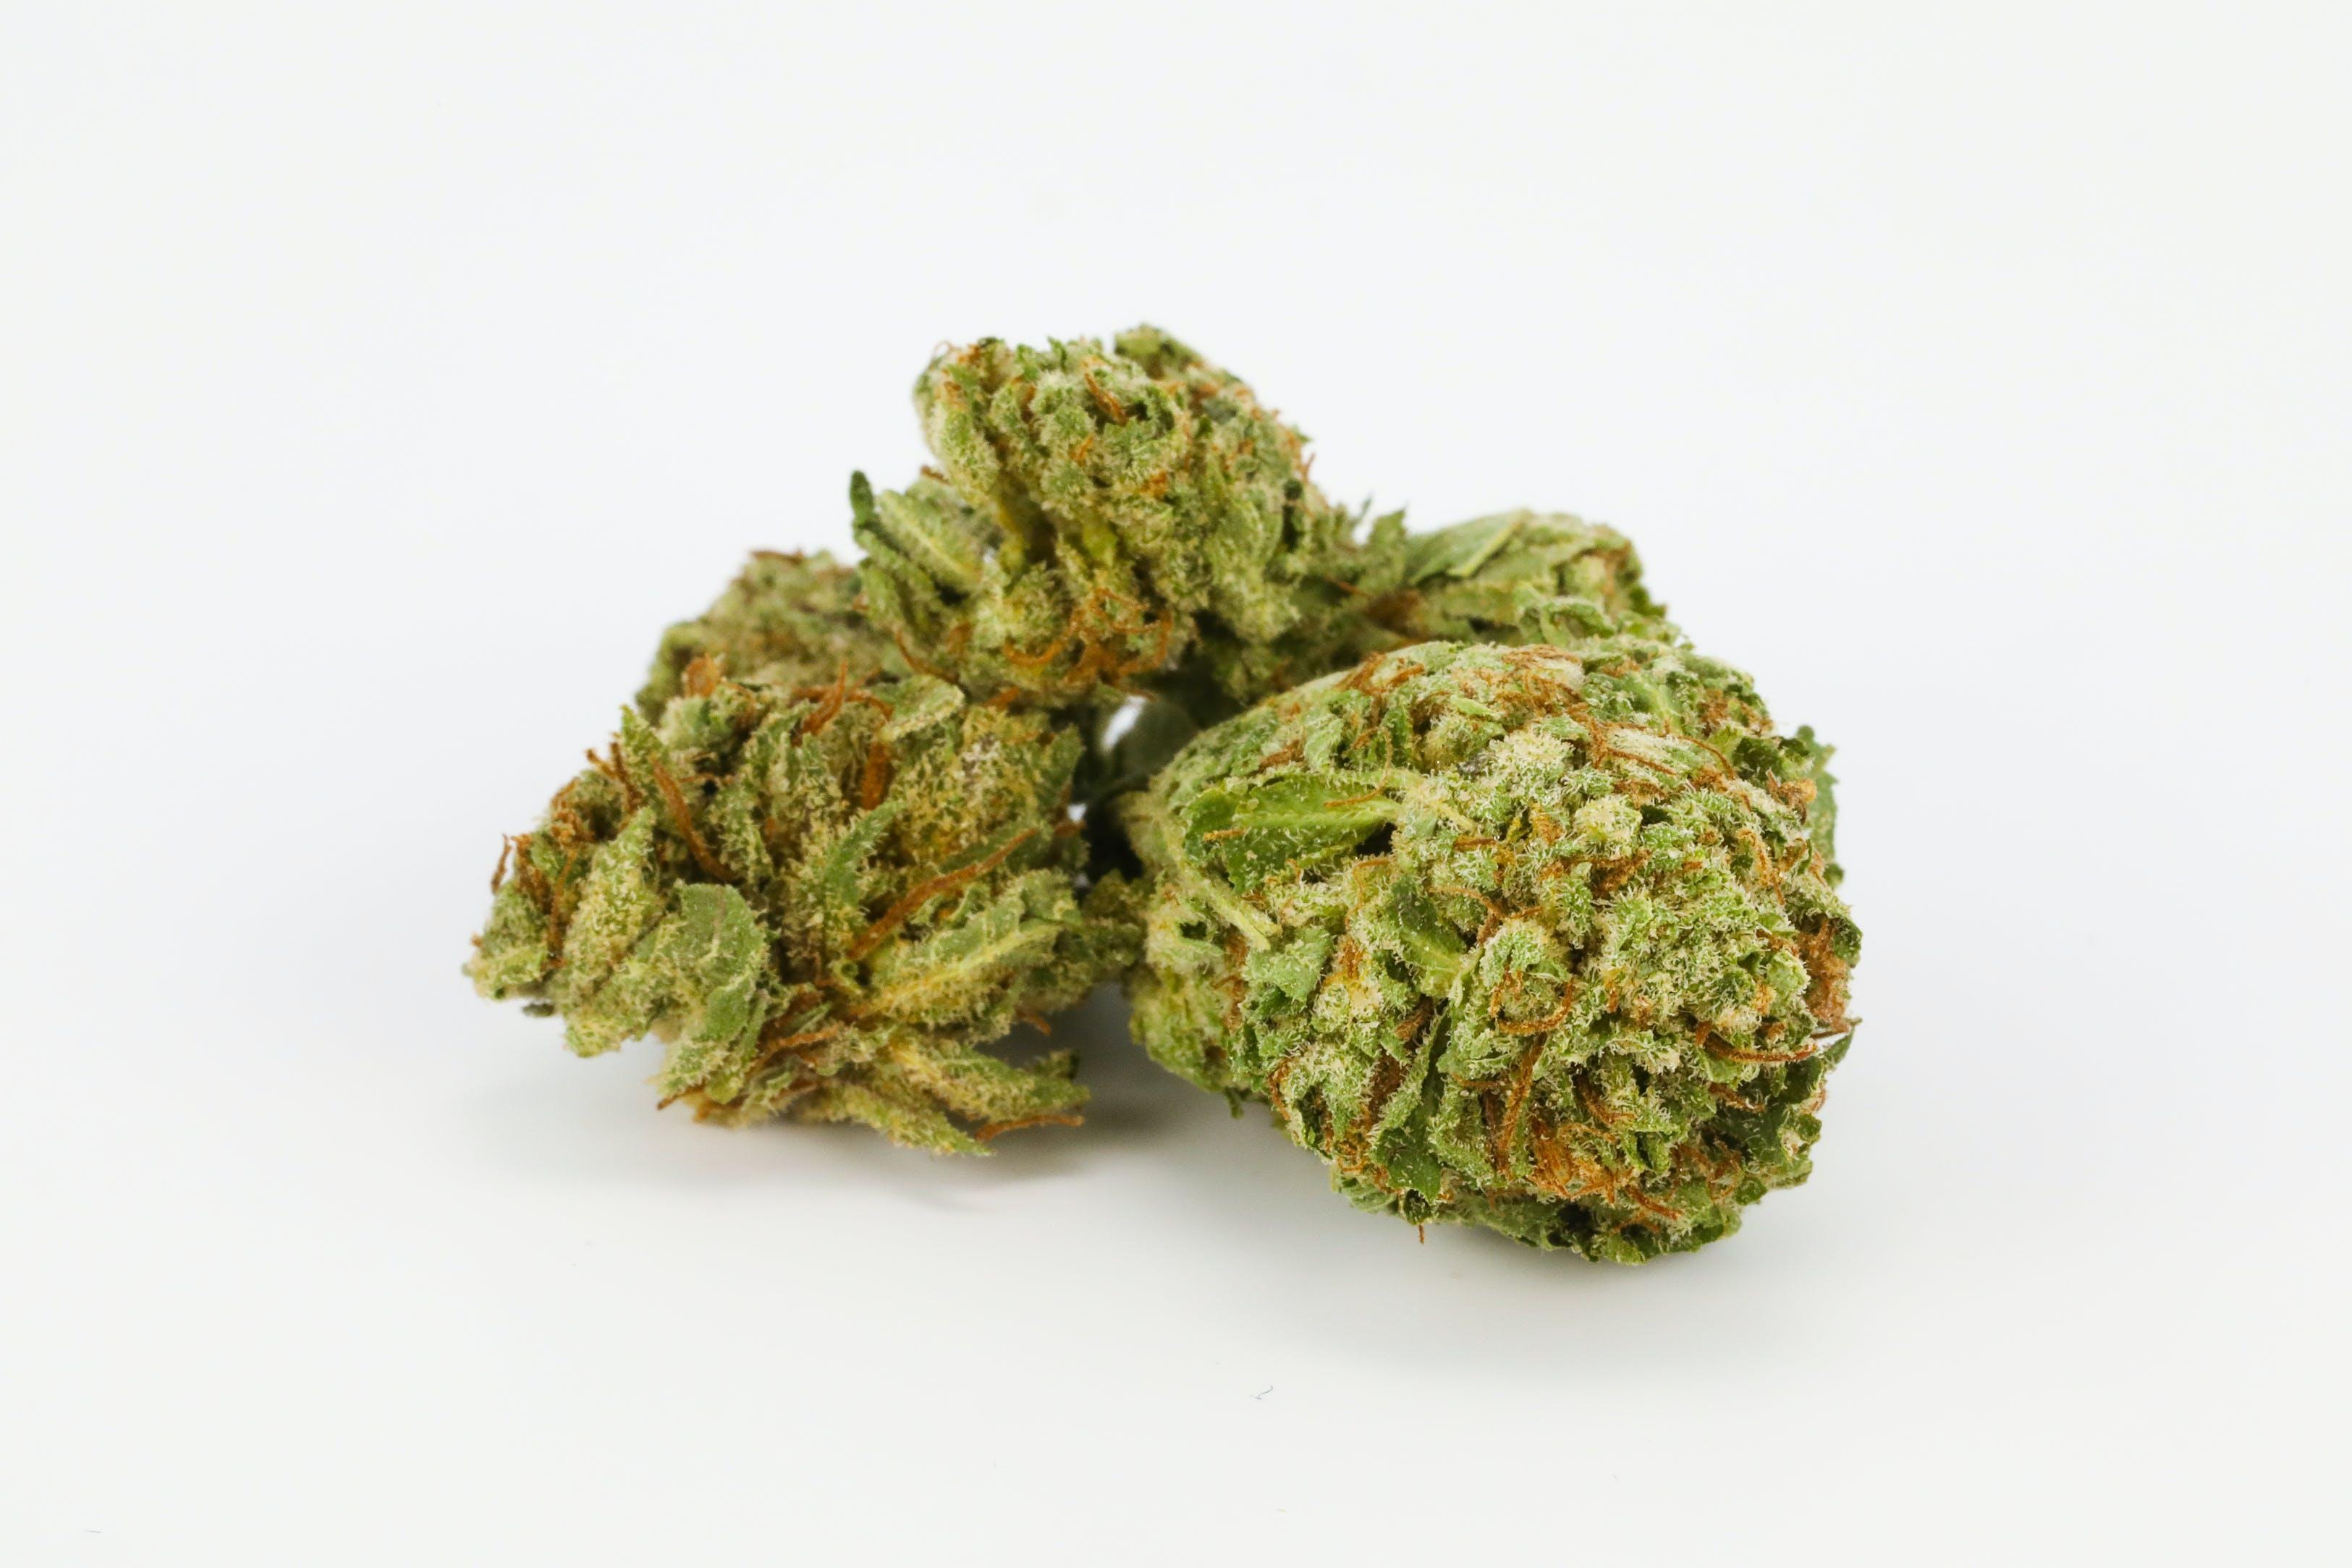 Leia OG Weed; Leia OG Cannabis Strain; Leia OG Hybrid Marijuana Strain